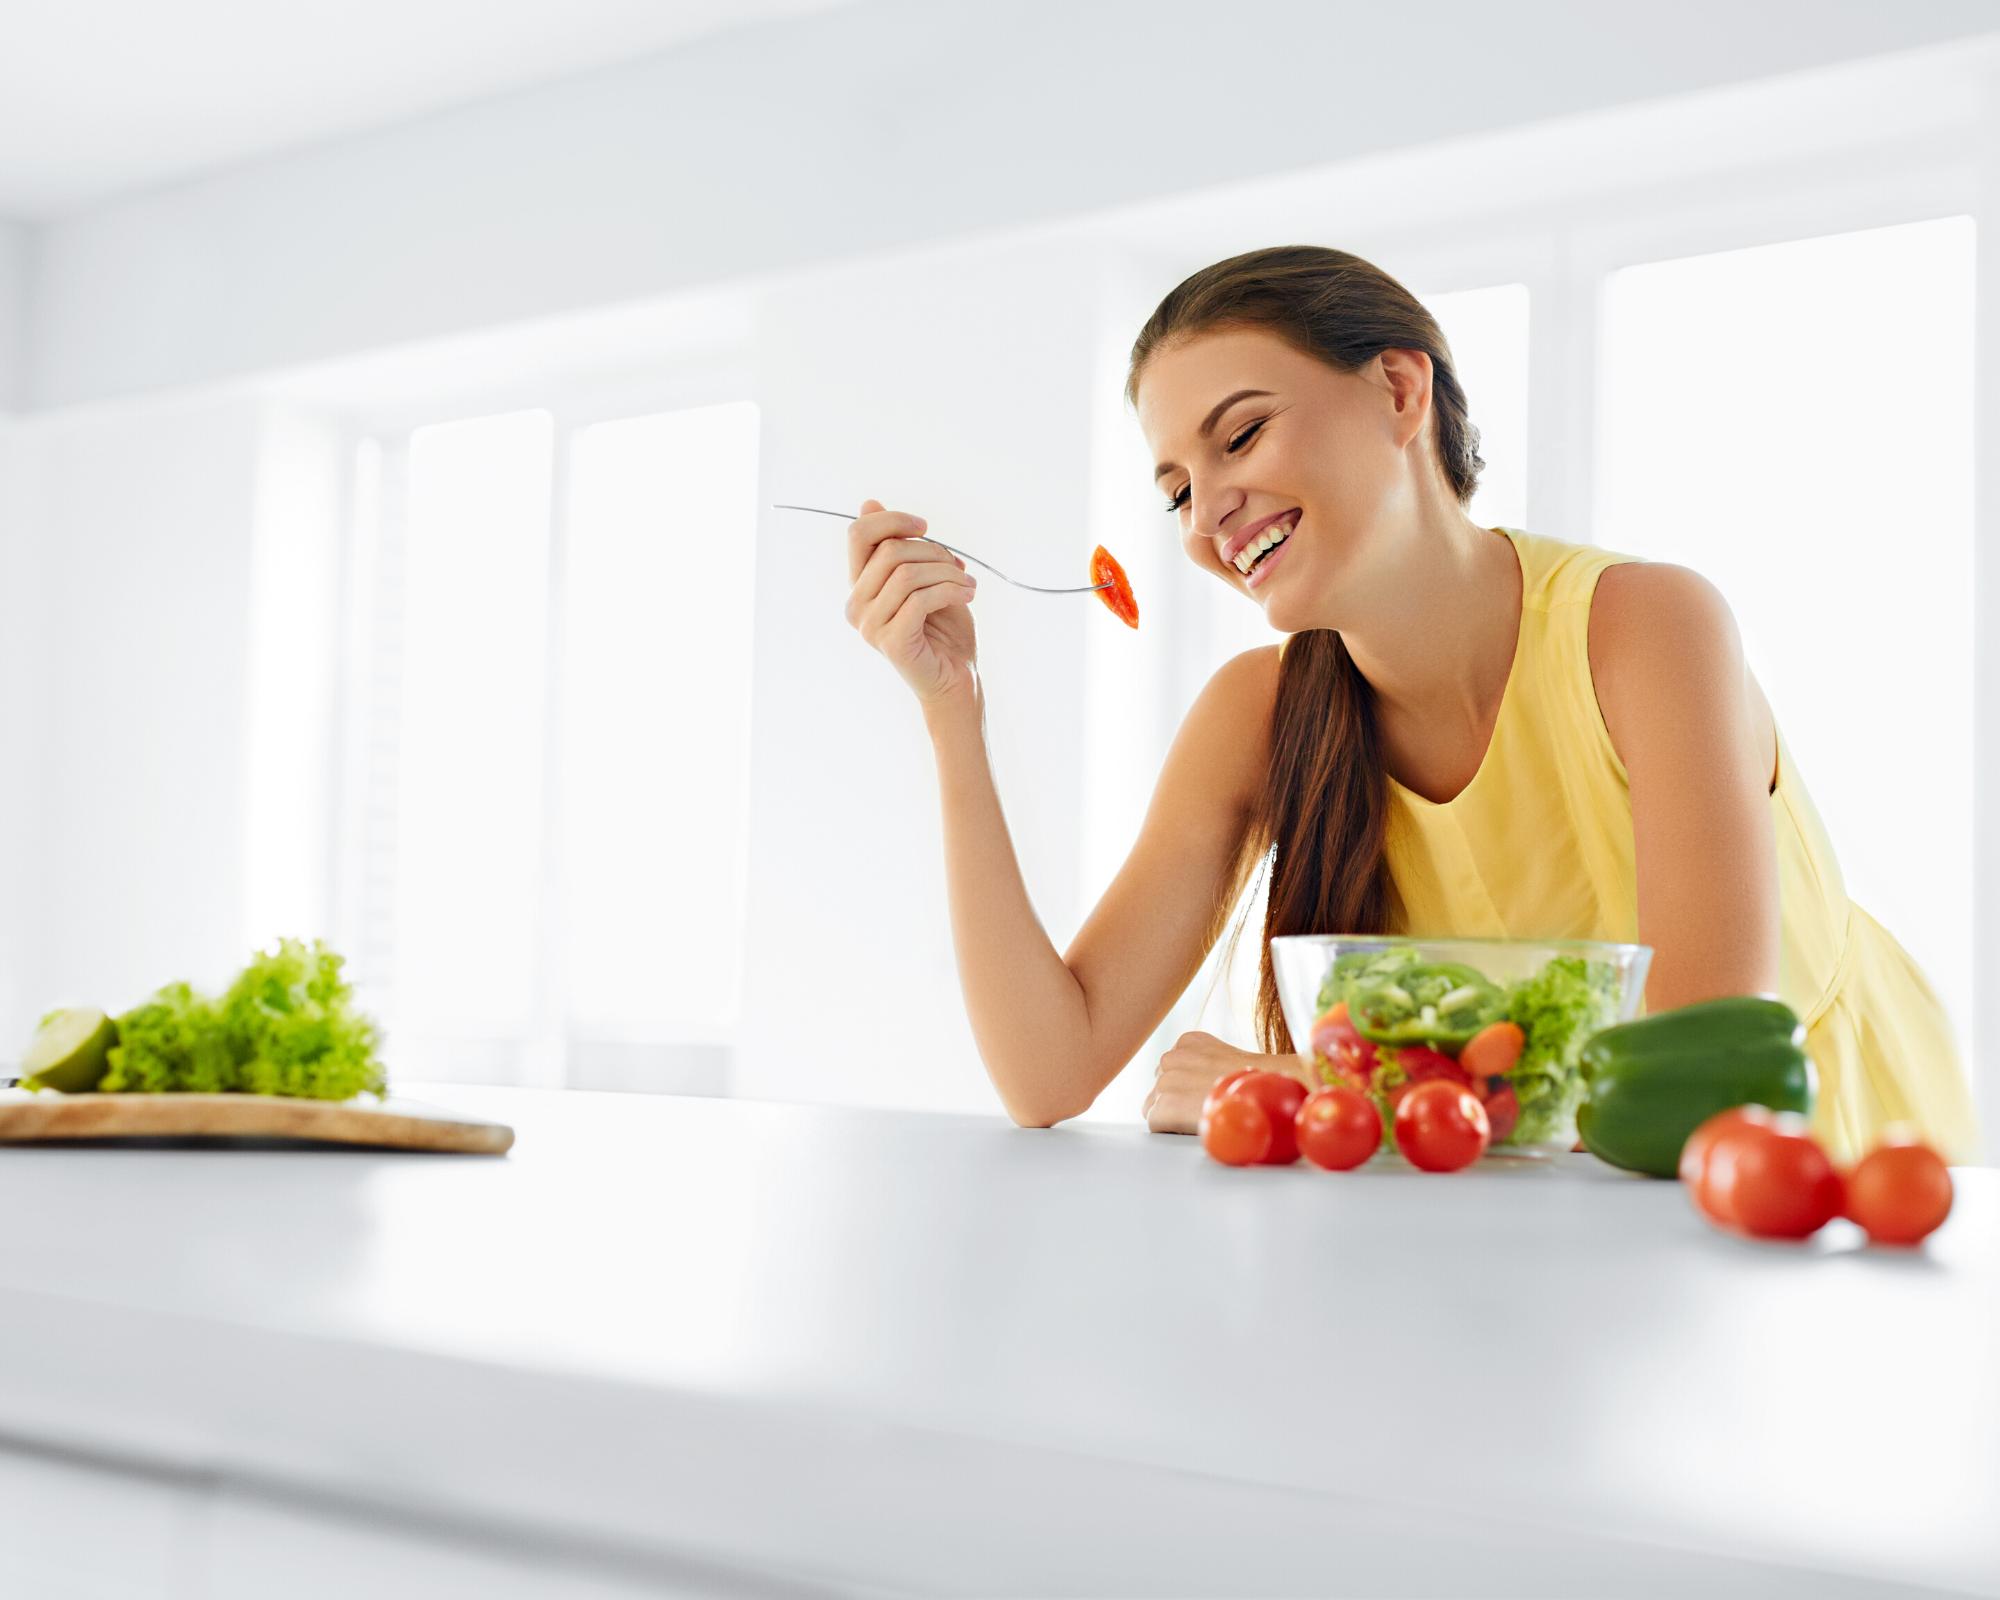 Women smiling as she enjoys her salad.